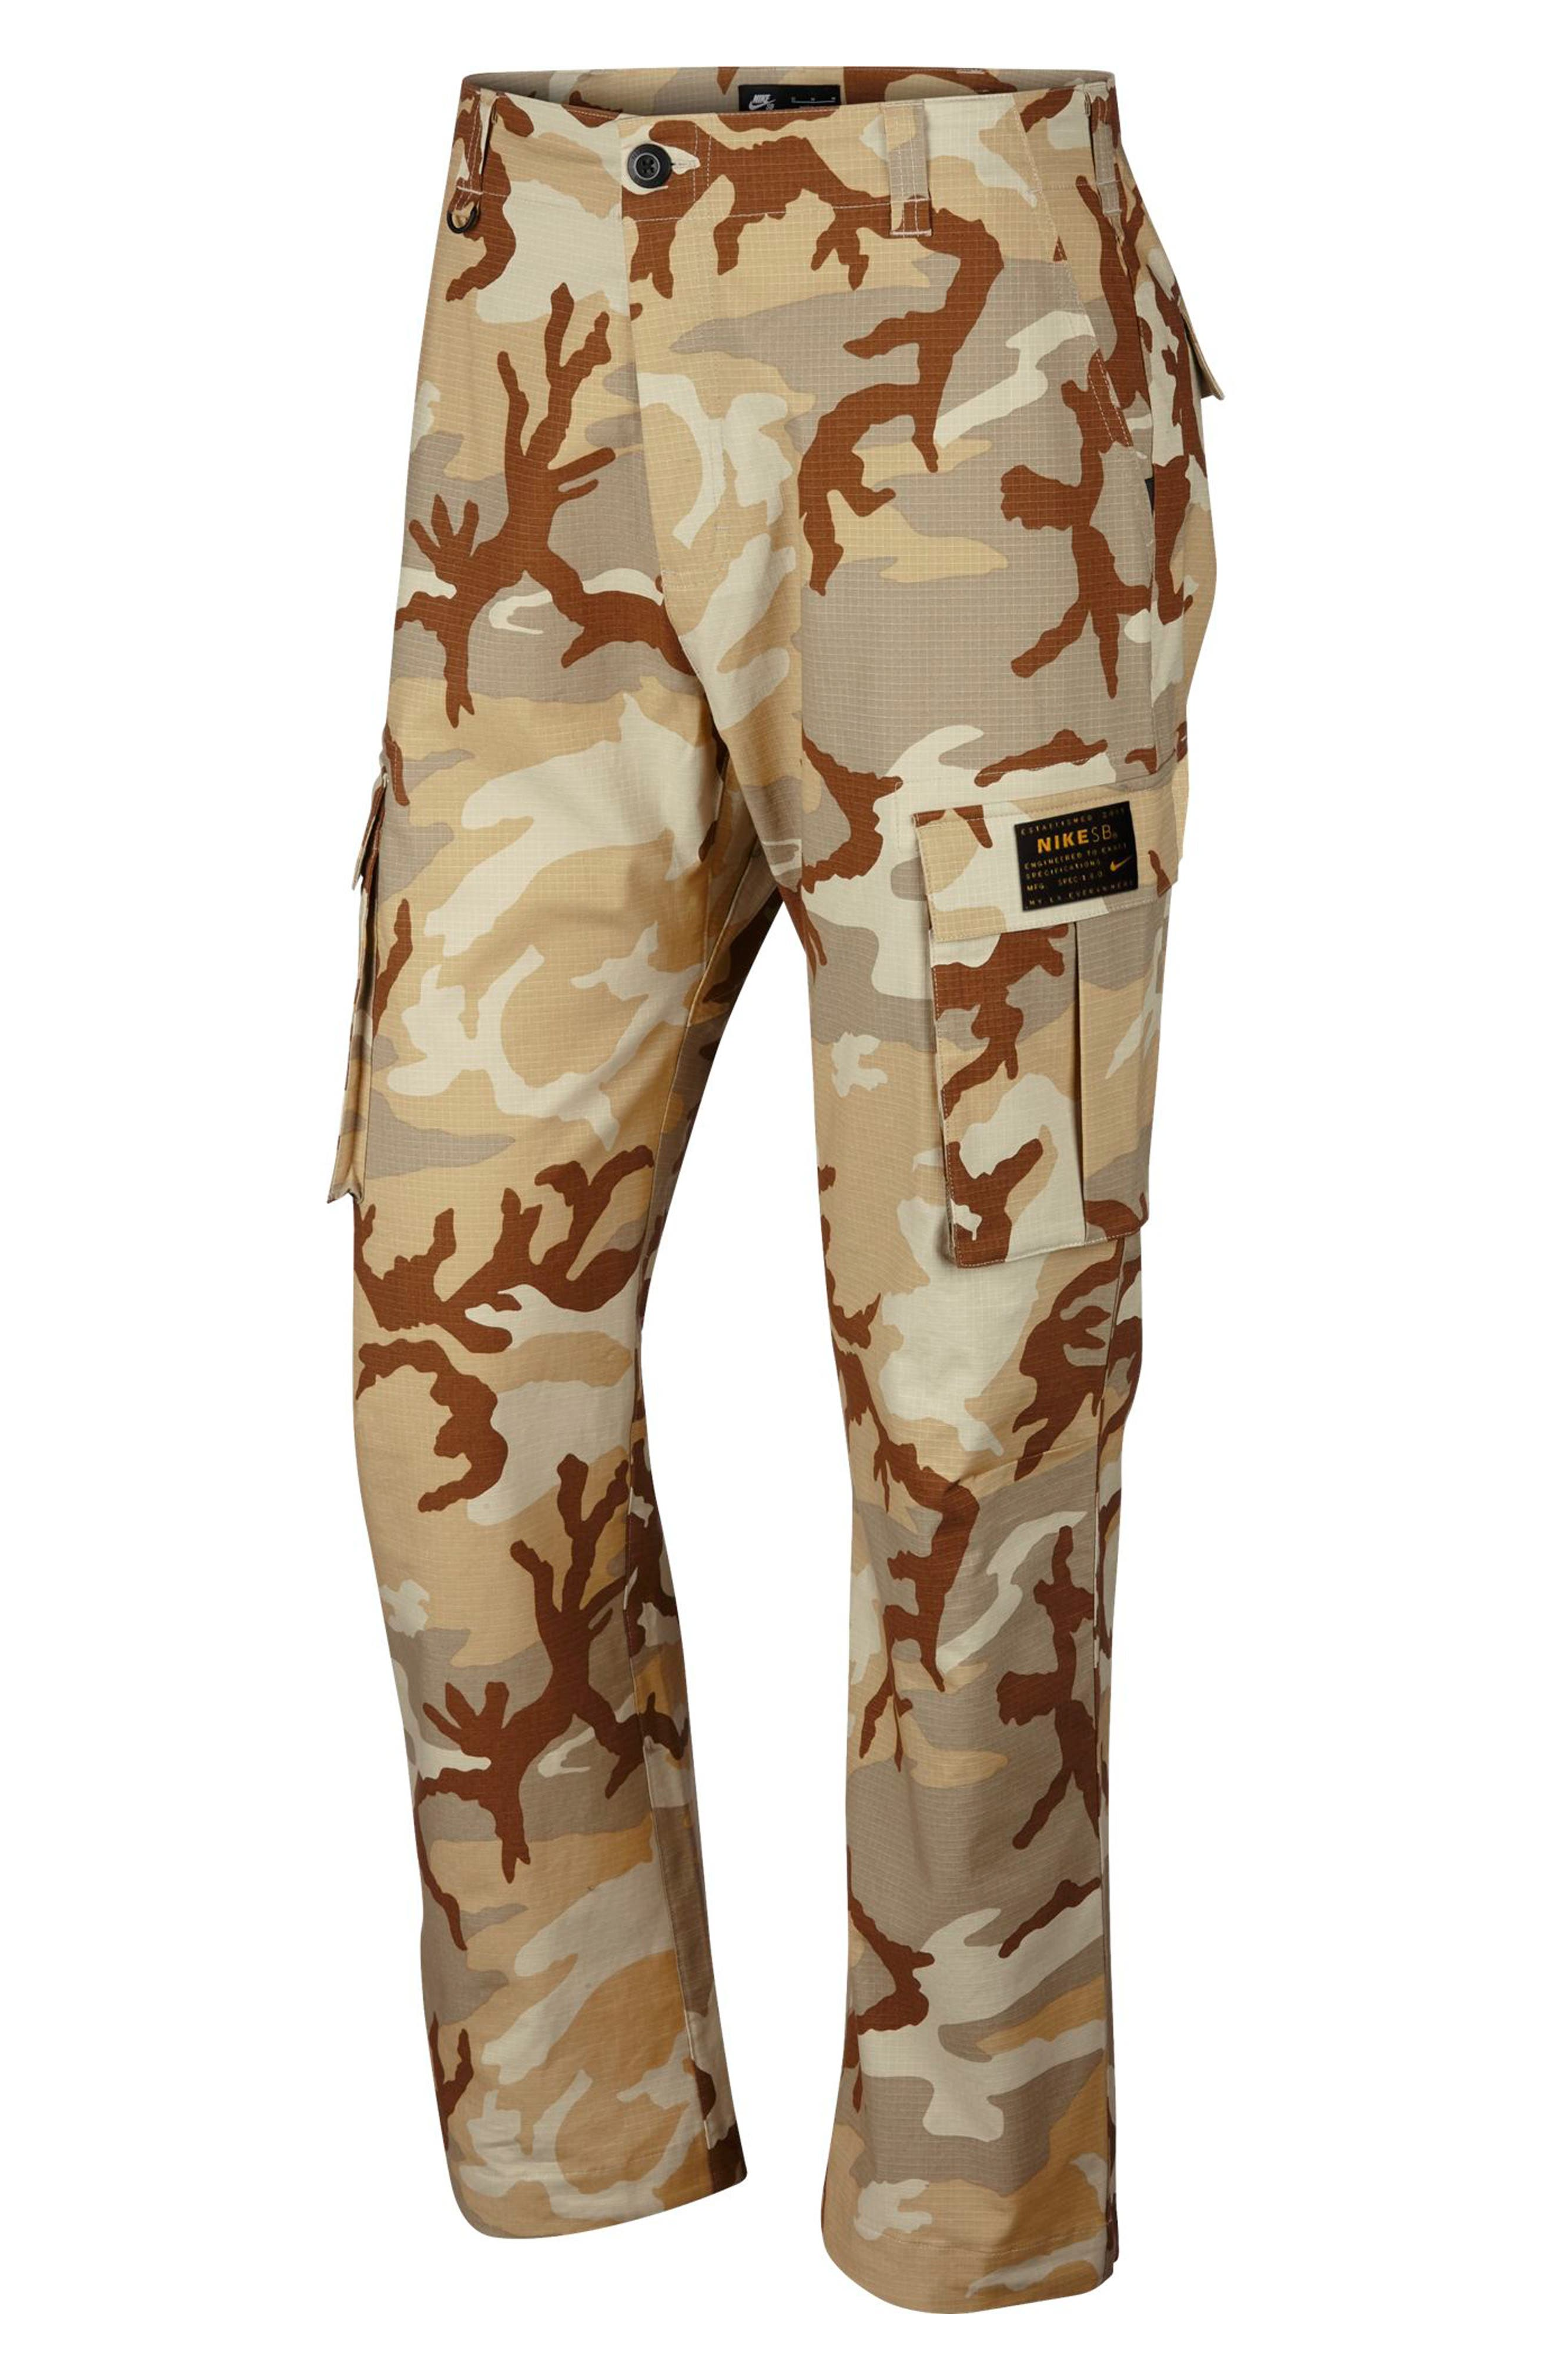 NIKE SB, Flex Cargo Pants, Main thumbnail 1, color, 248